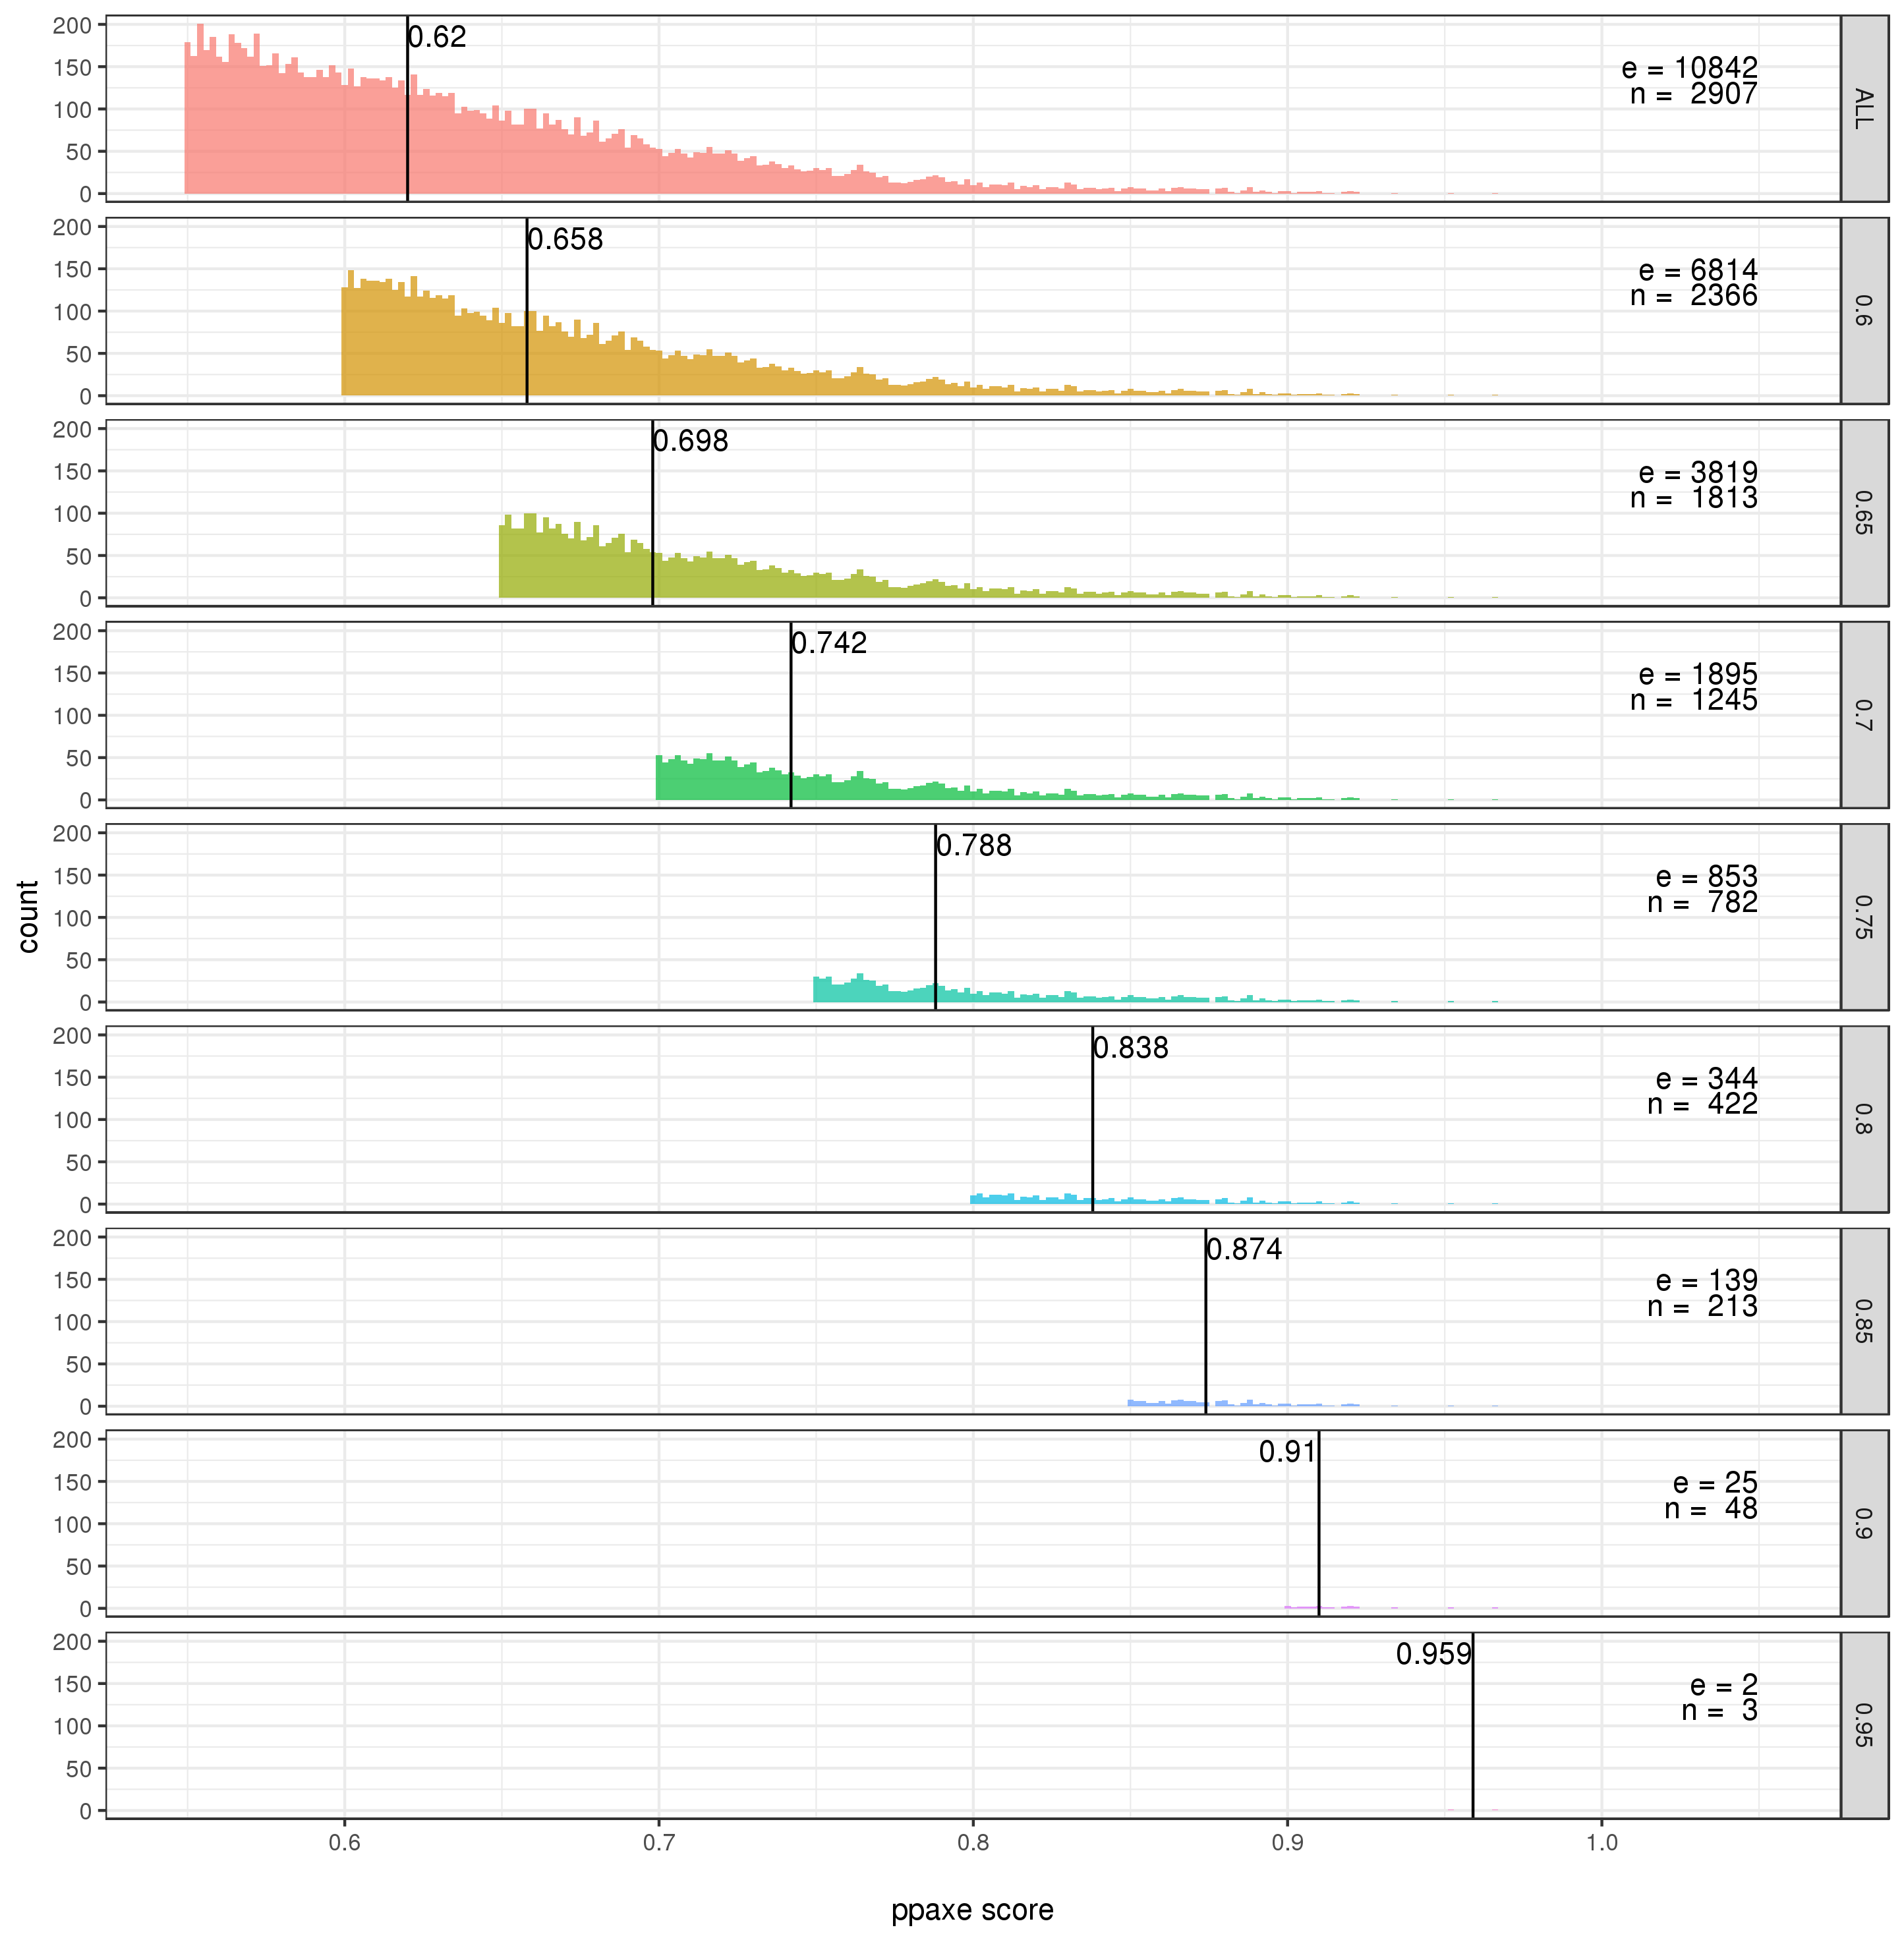 PPaxe Score Distribution